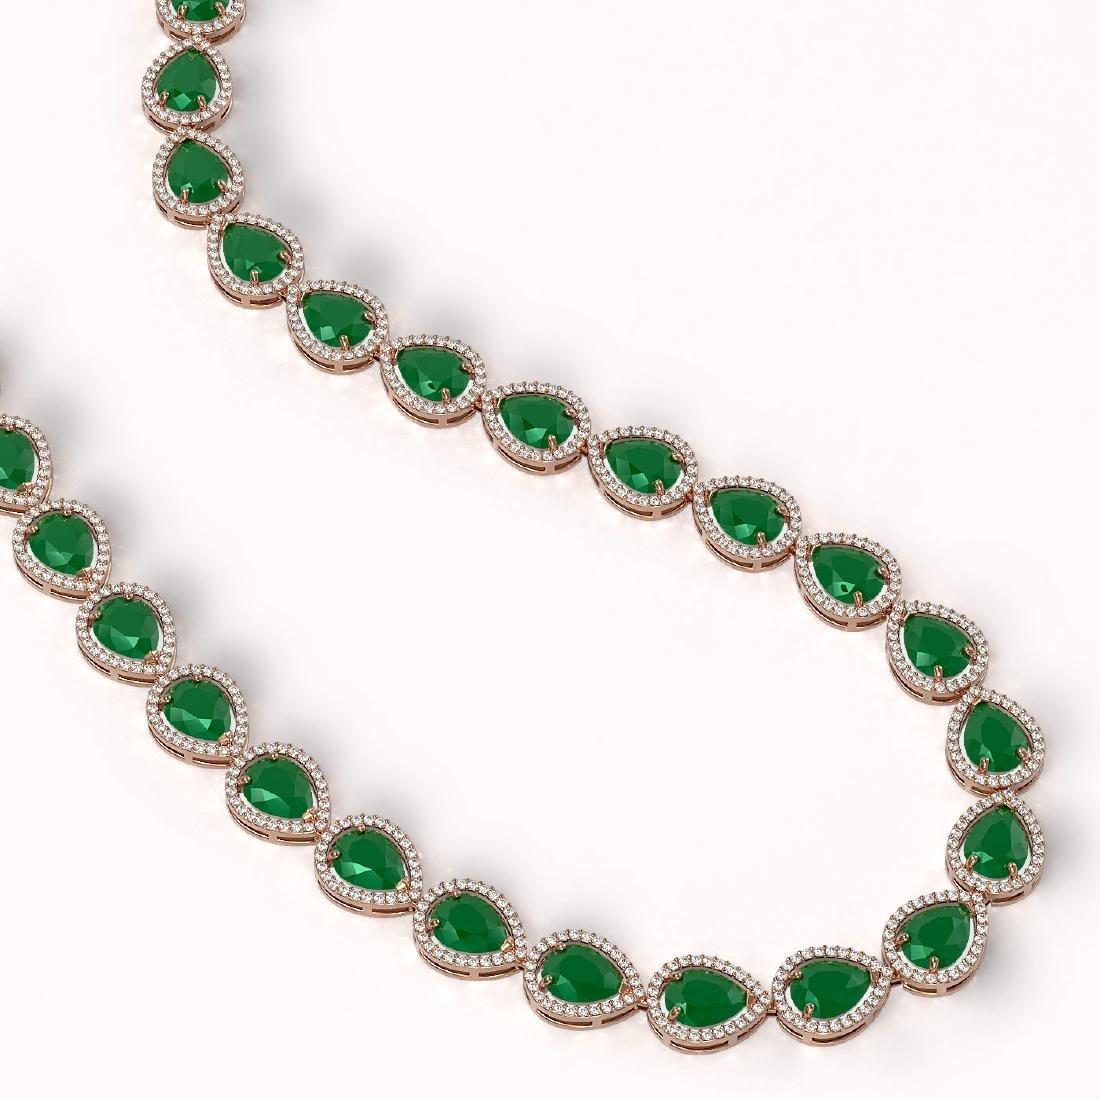 64.01 CTW Emerald & Diamond Halo Necklace 10K Rose Gold - 2